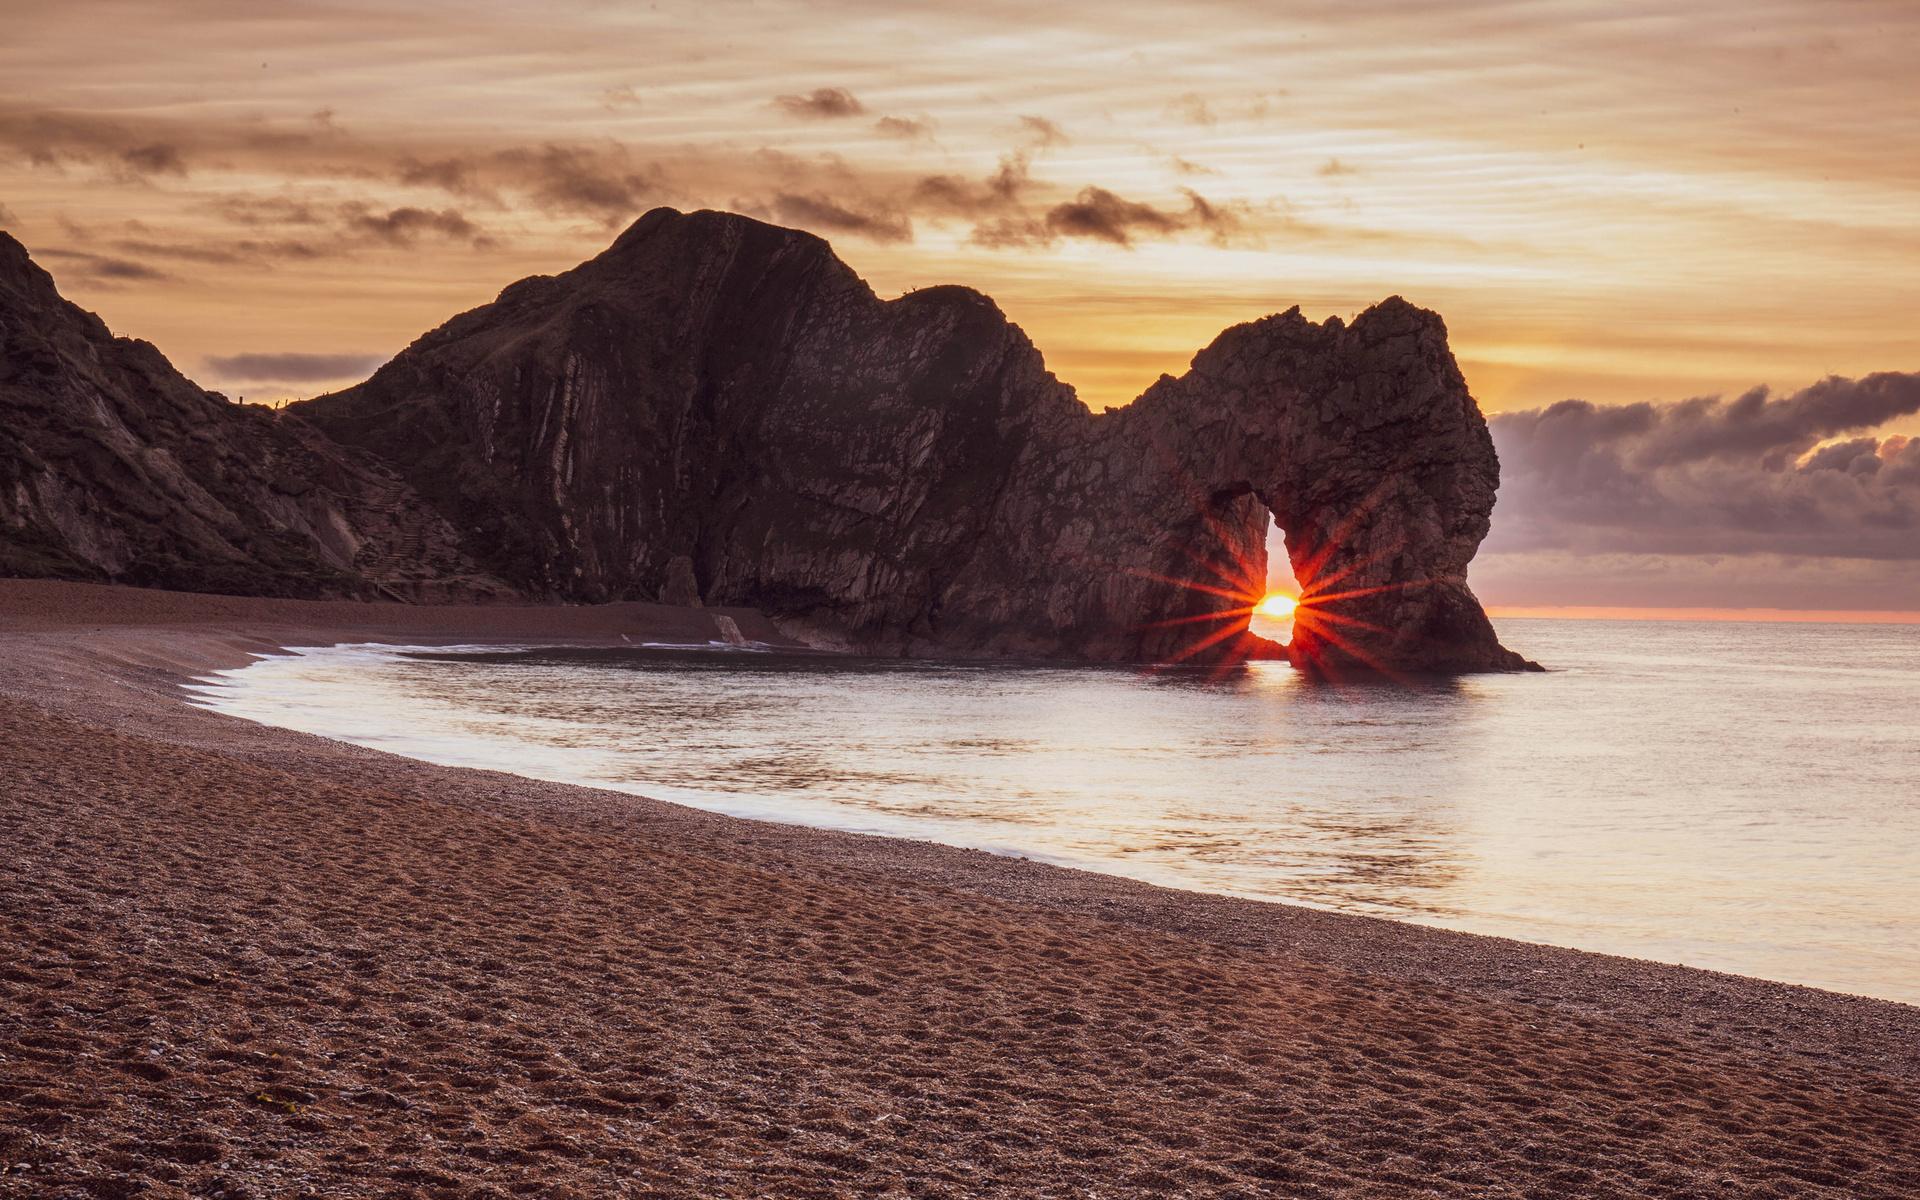 sunrise-and-sunset-coast-4k-mc.jpg